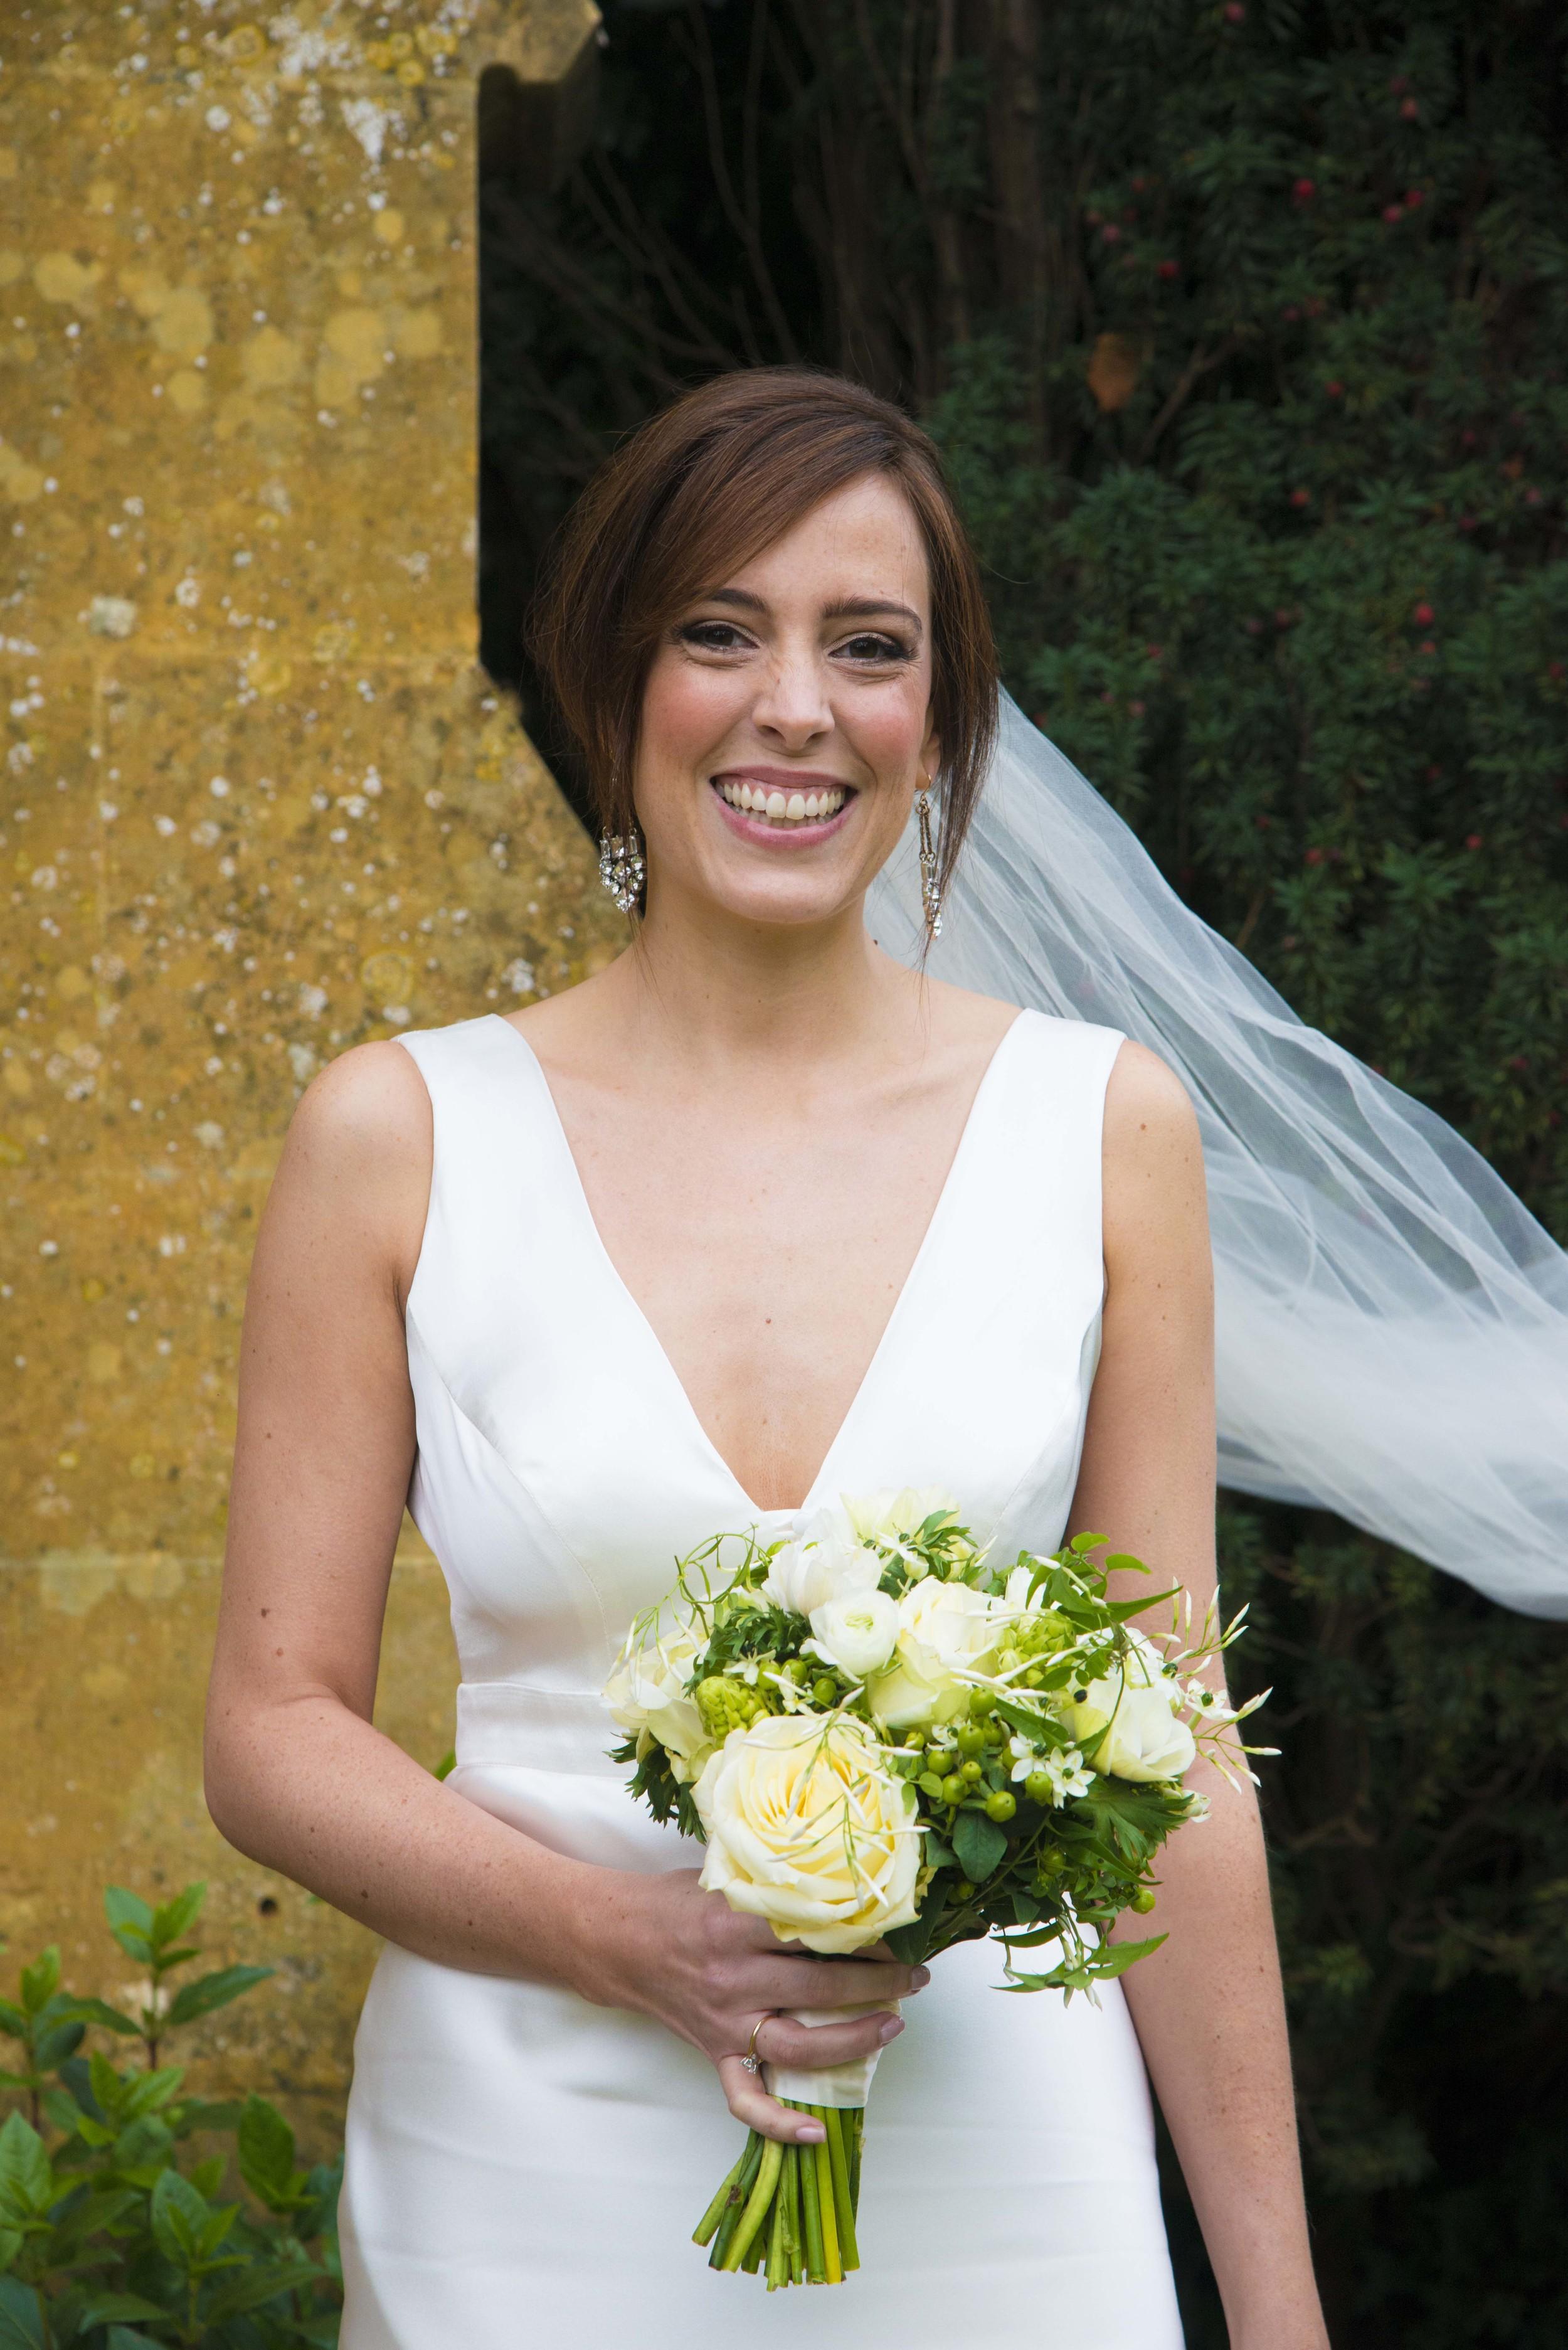 Bride - Romilly (Dec 2013)